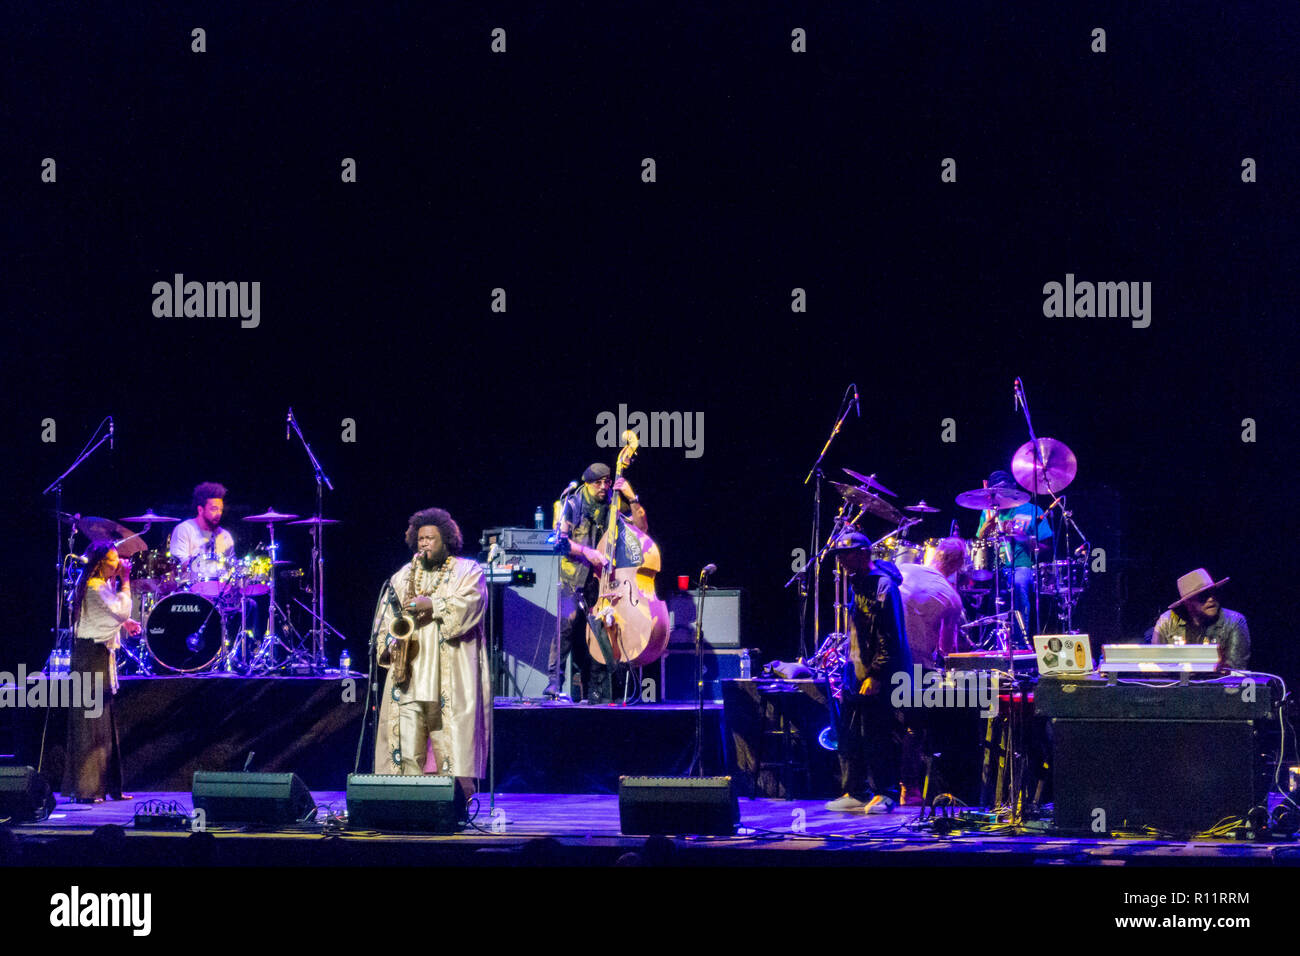 Toronto, Canada - Nov 5, 2018: Kamasi Washington live at Sony Centre. Toronto, Canada - Stock Image